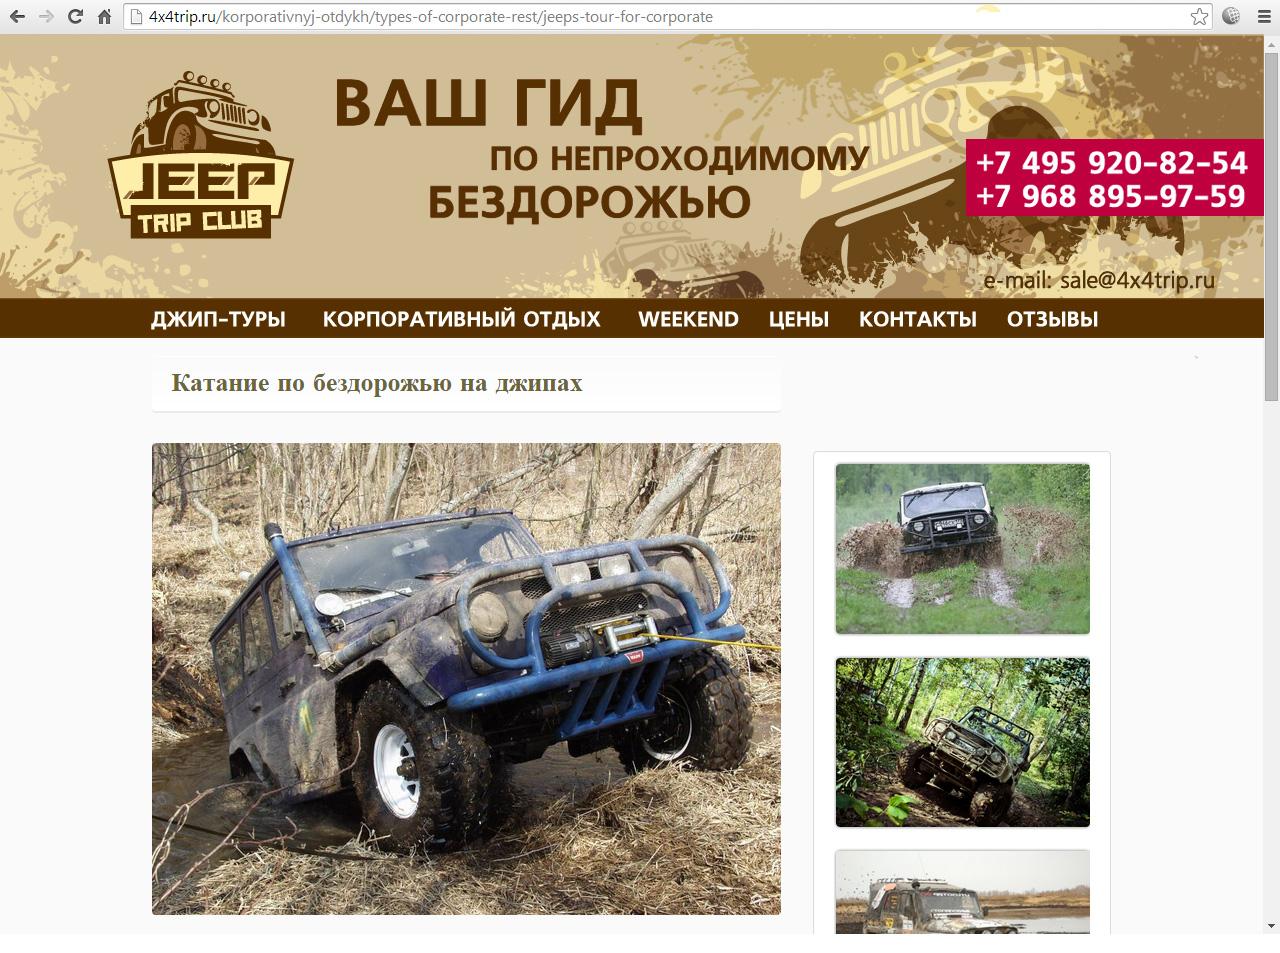 Создать или переработать логотип для Jeep Trip Club фото f_431542a9a5148548.jpg